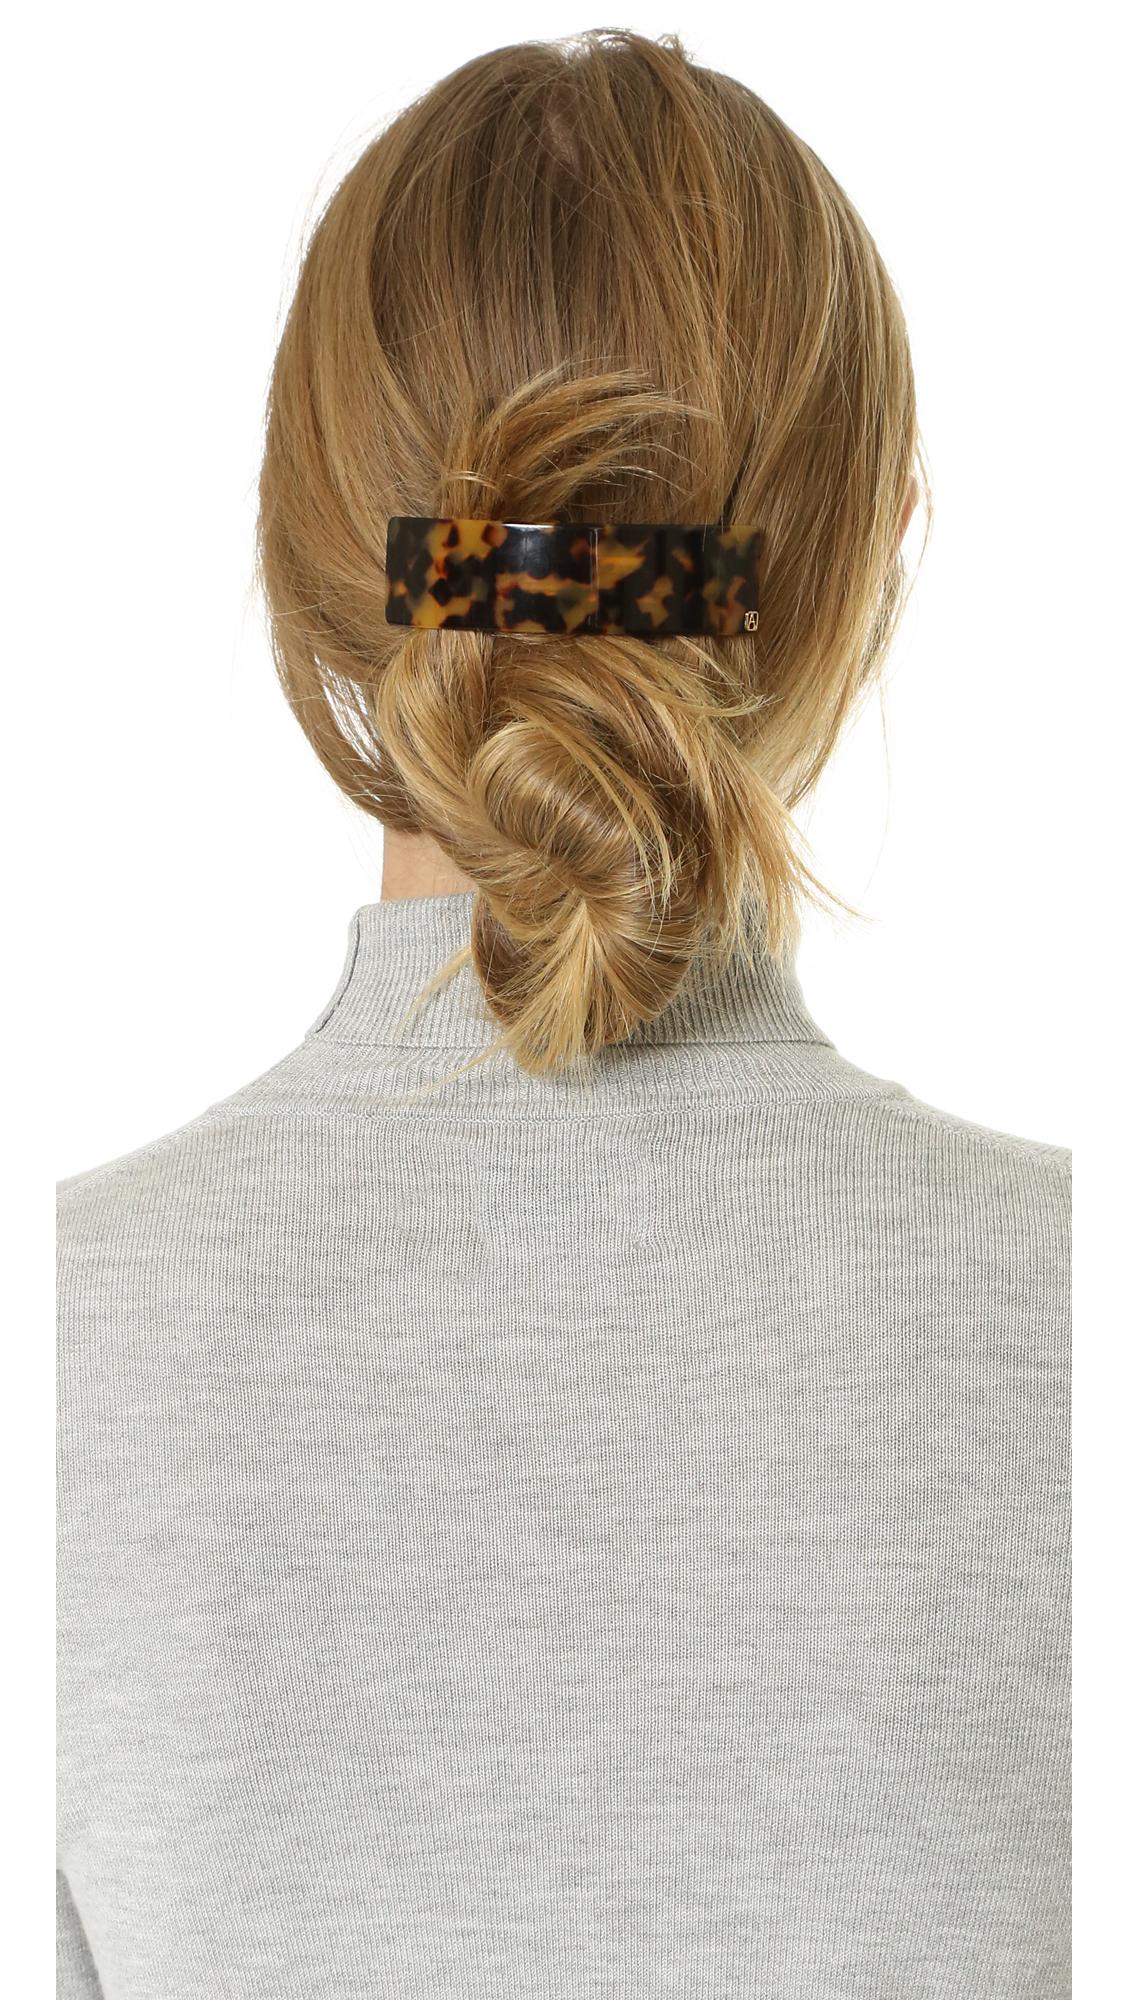 Alexandre De Paris Thick Hair Clip In Brown Lyst